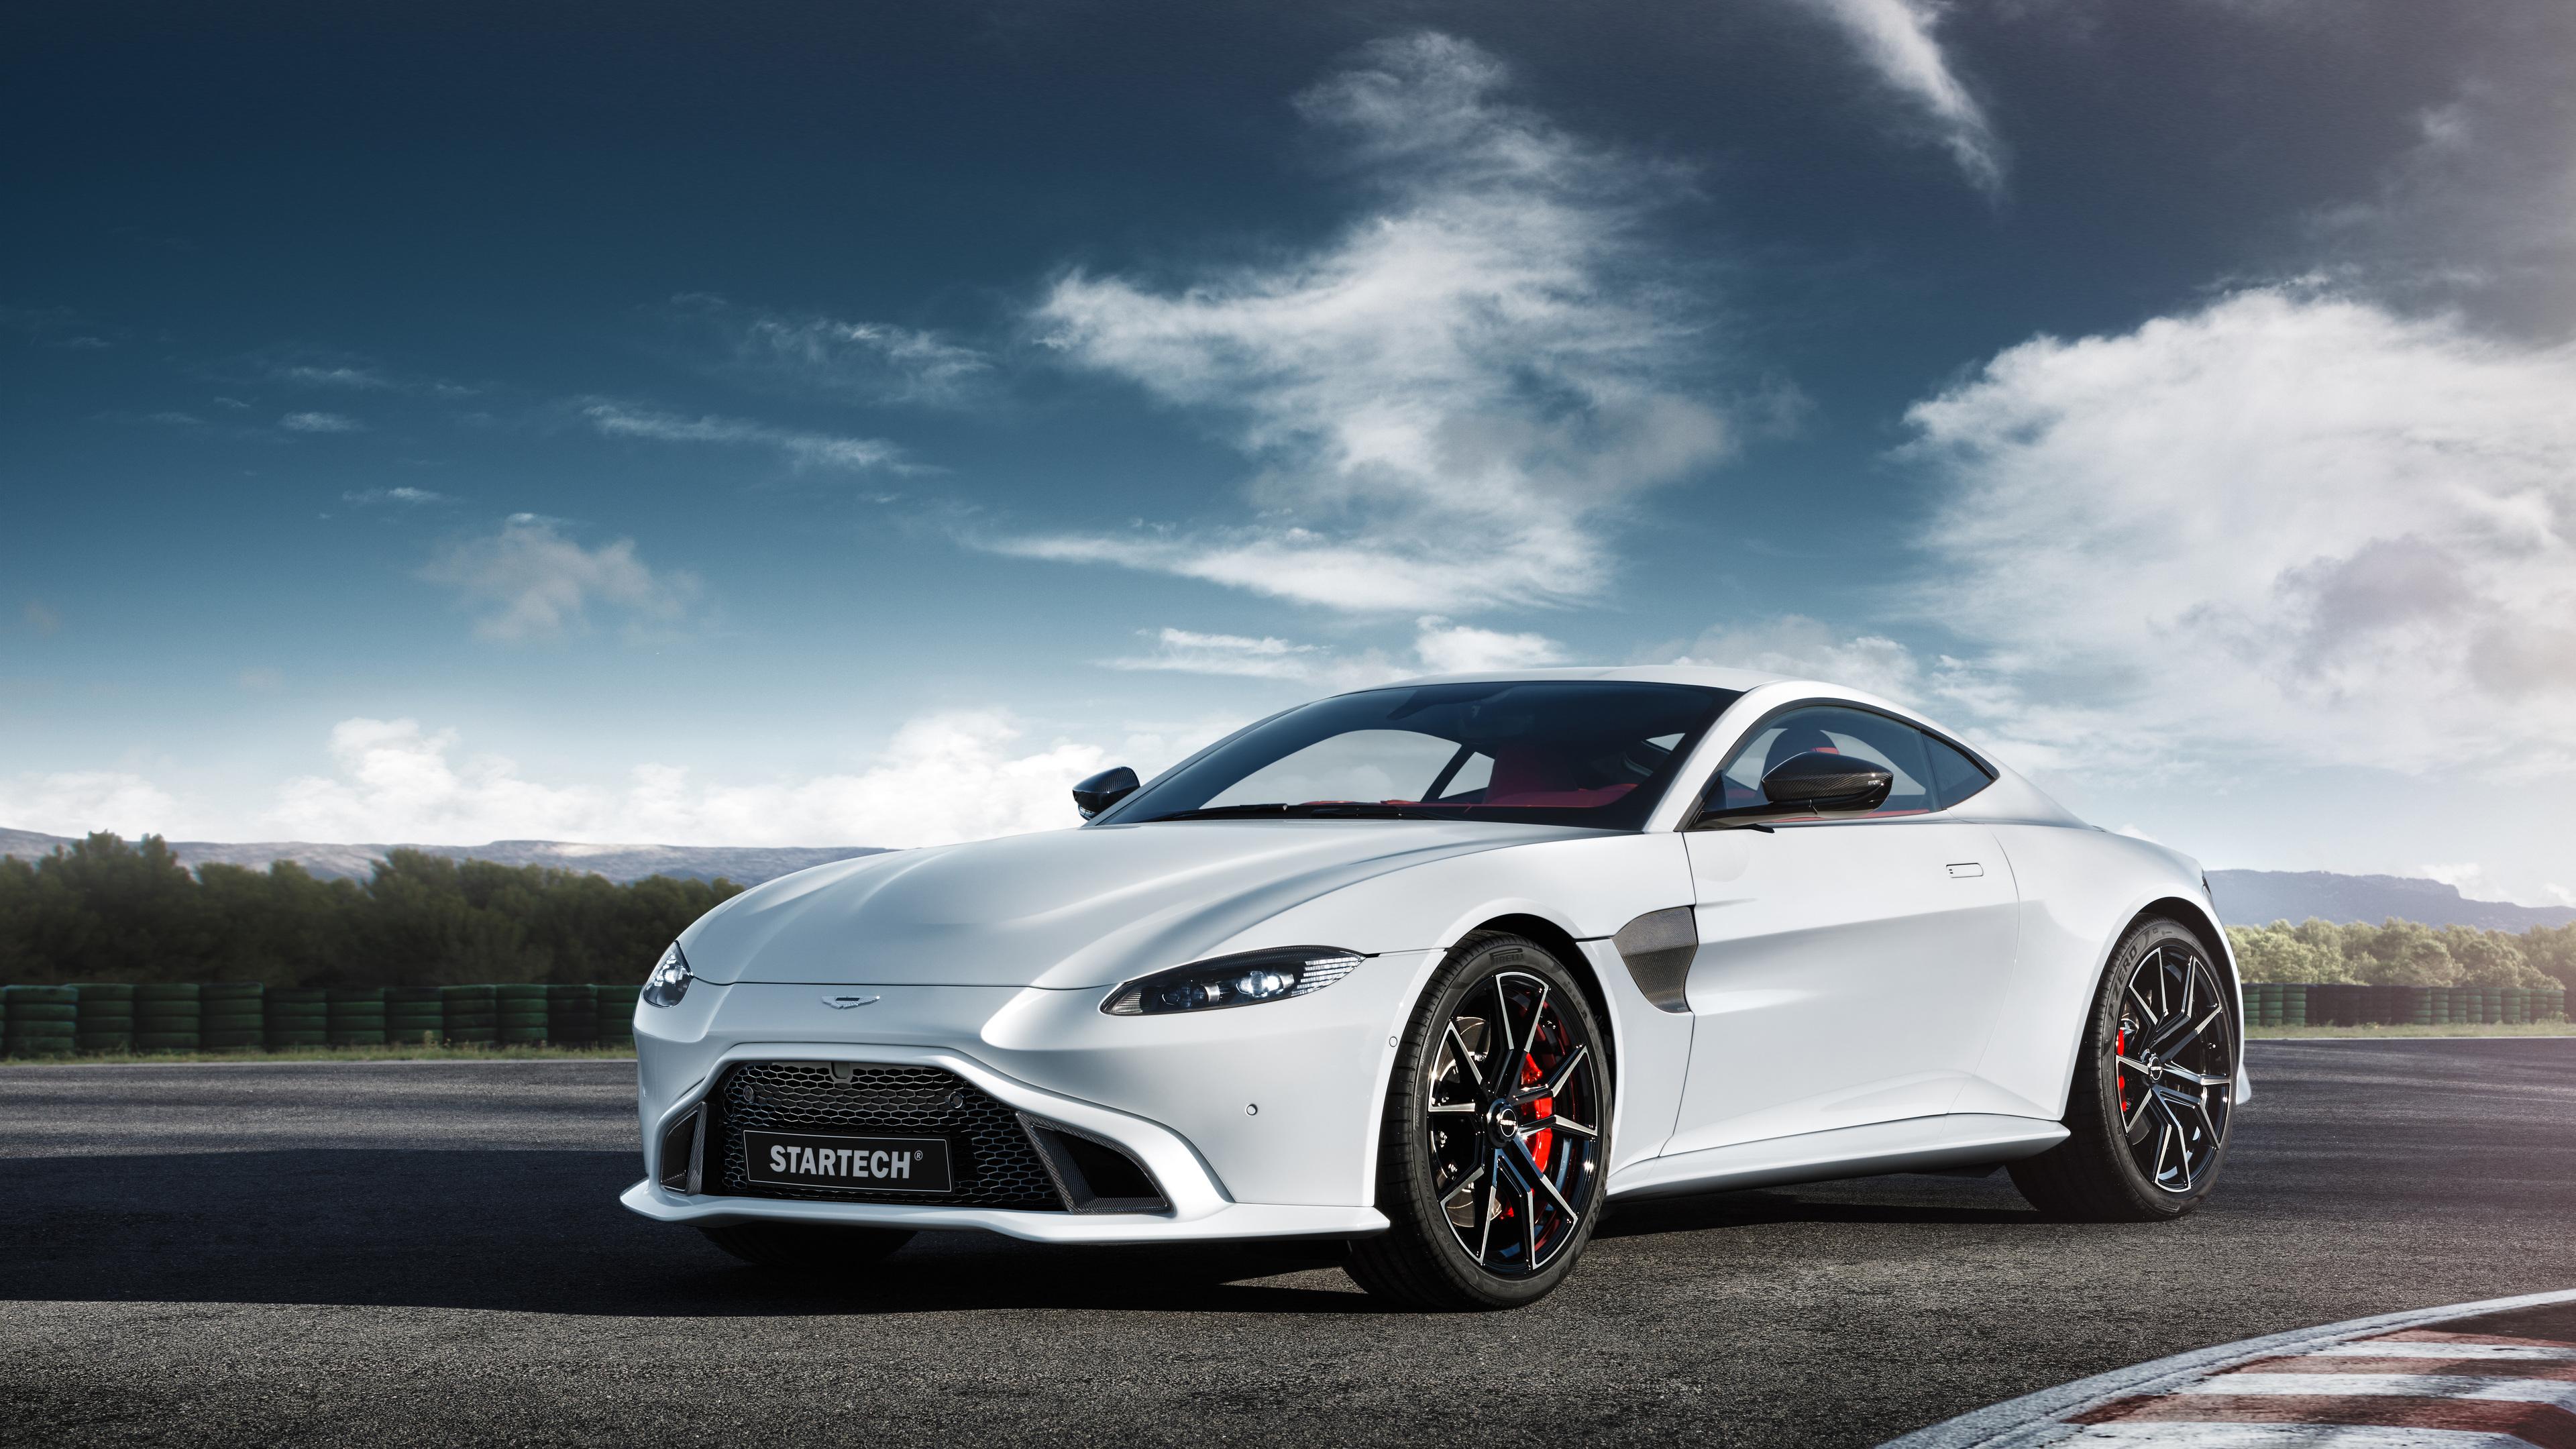 Wallpaper 4k Startech Aston Martin Vantage 2019 4k 2019 Cars